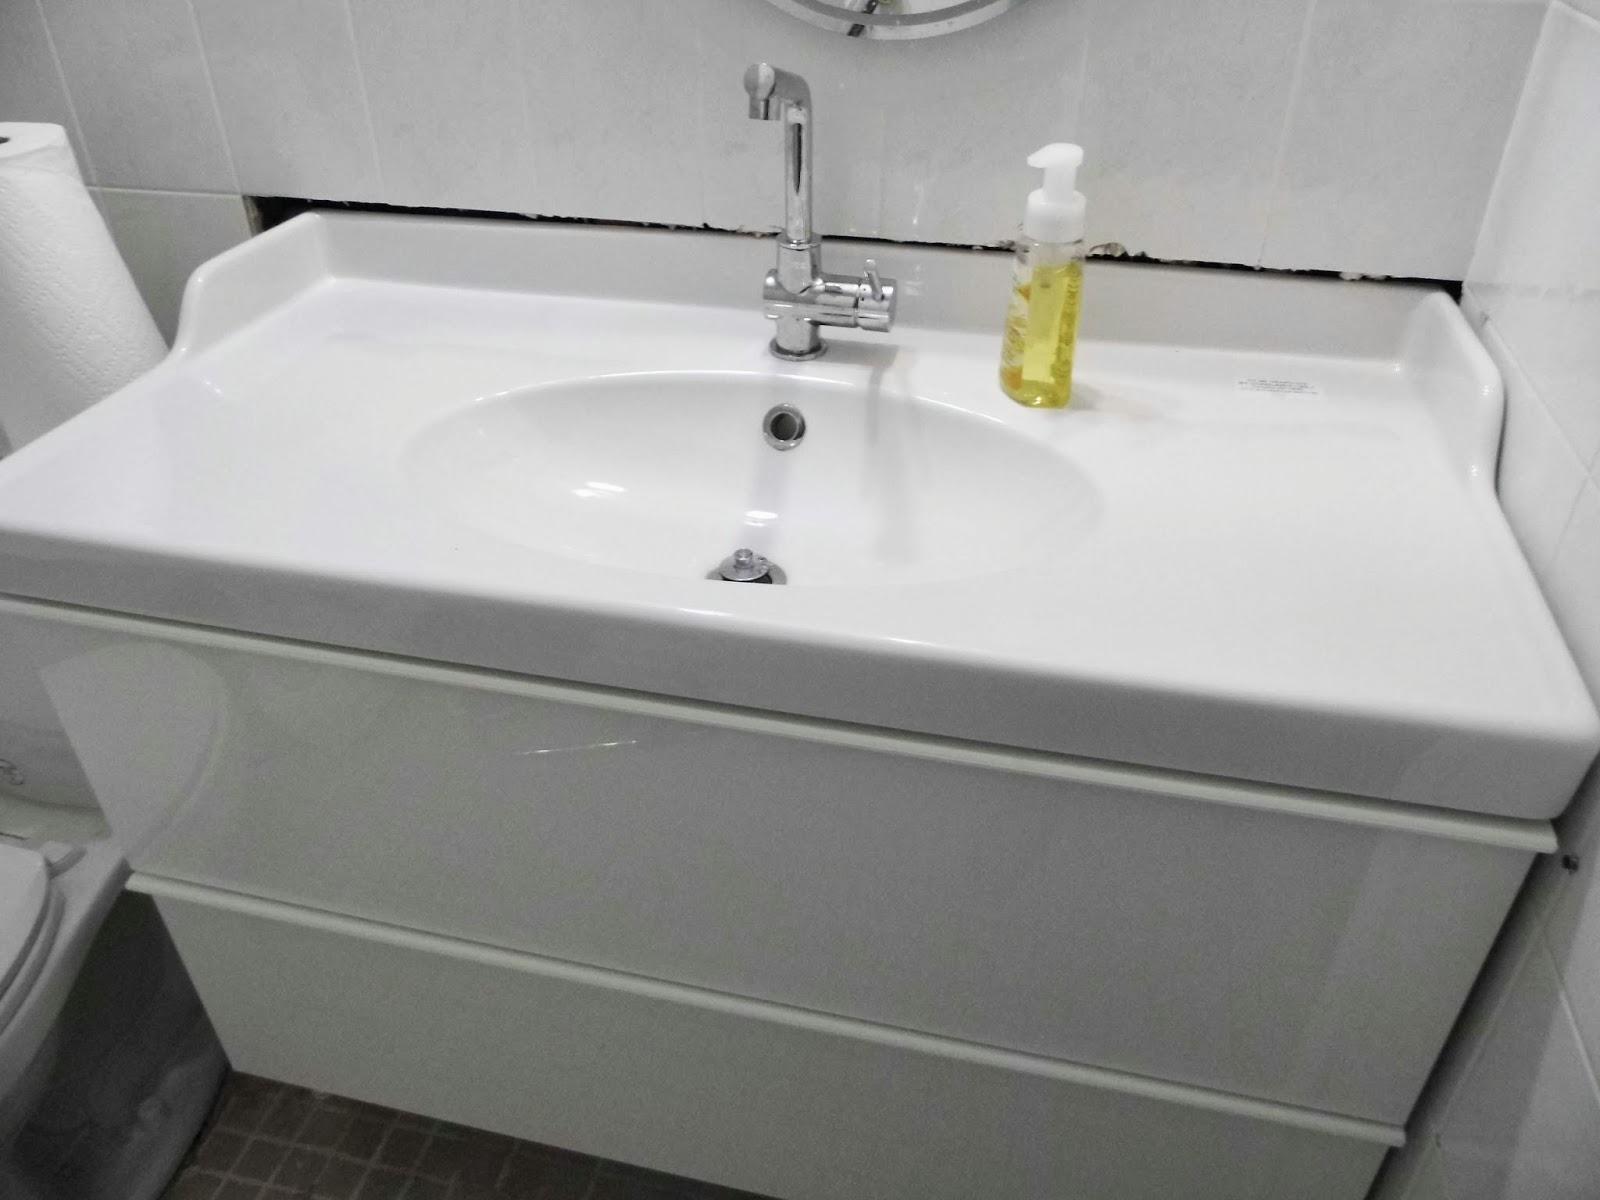 Fresh Coat Of Paint A Sink Ing Feeling